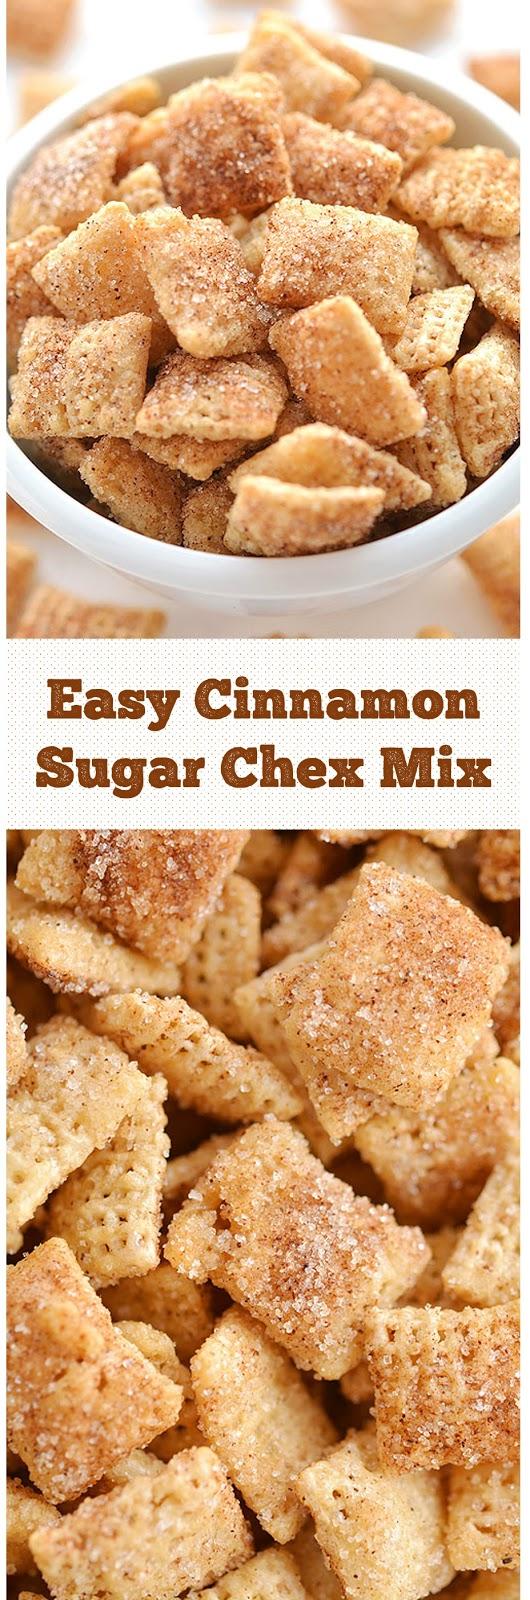 Easy Cinnamon Sugar Chex Mix